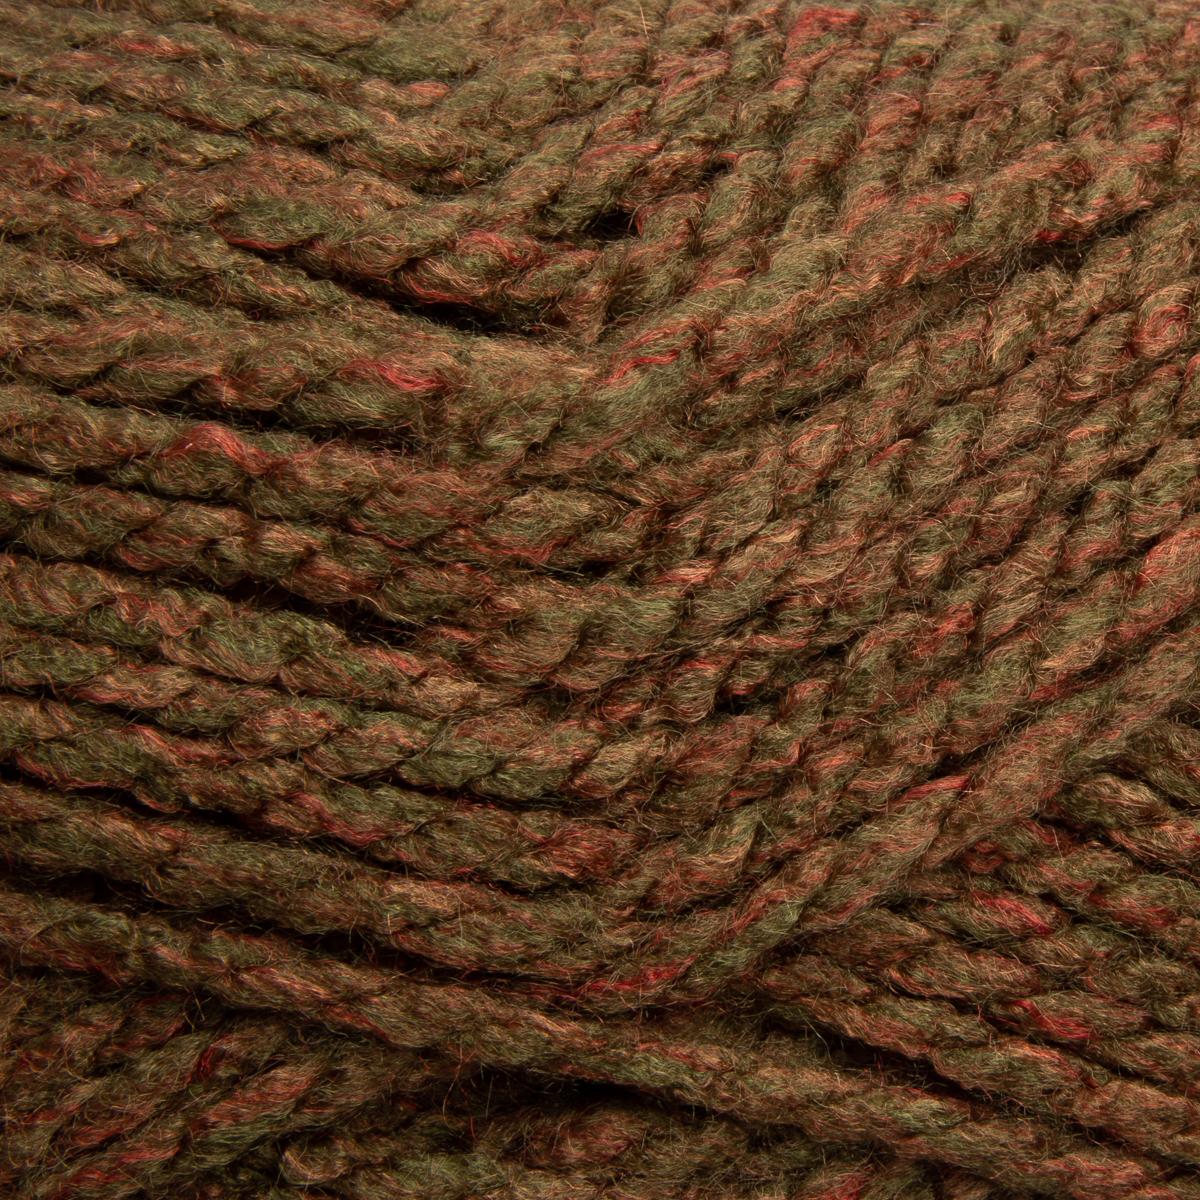 3pk-Premier-Yarns-Deborah-Norville-Serenity-100-Acrylic-Yarn-Chunky-5-Knitting thumbnail 95